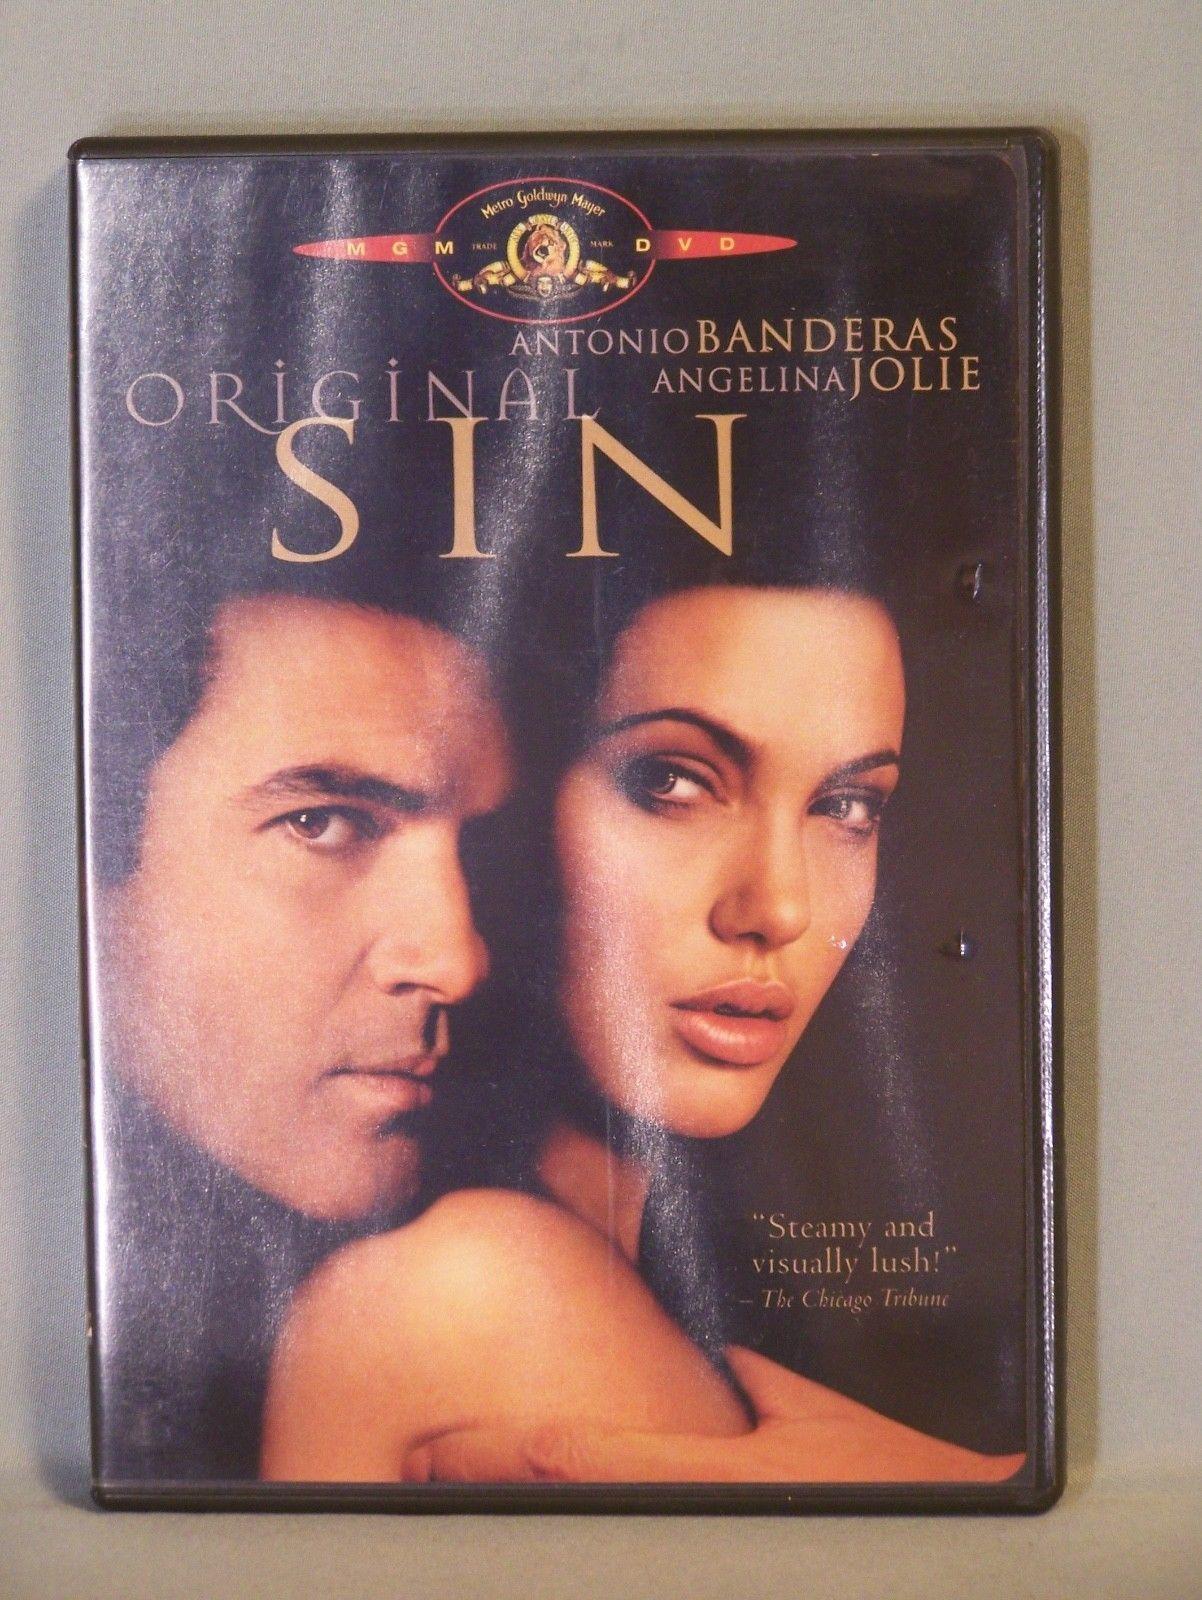 Angelina Jolie Original Sin original sin - antonio banderas & angelina and 50 similar items